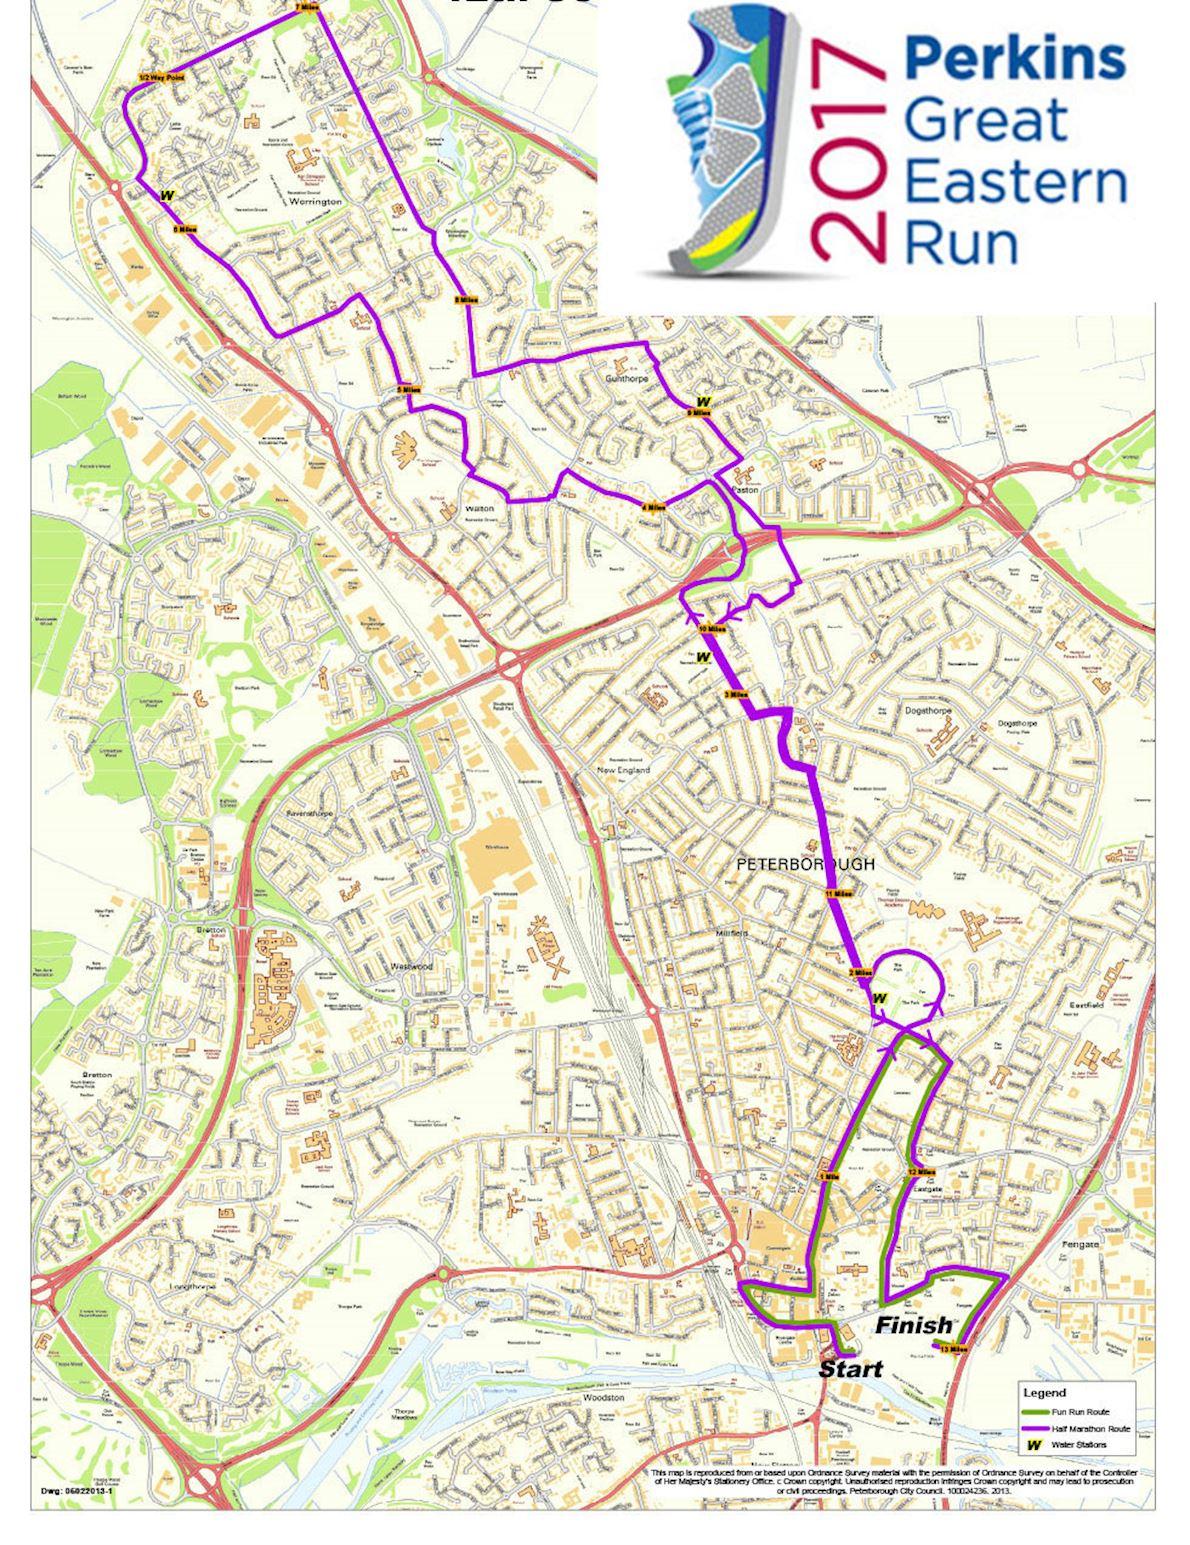 Perkins Great Eastern Run Mappa del percorso